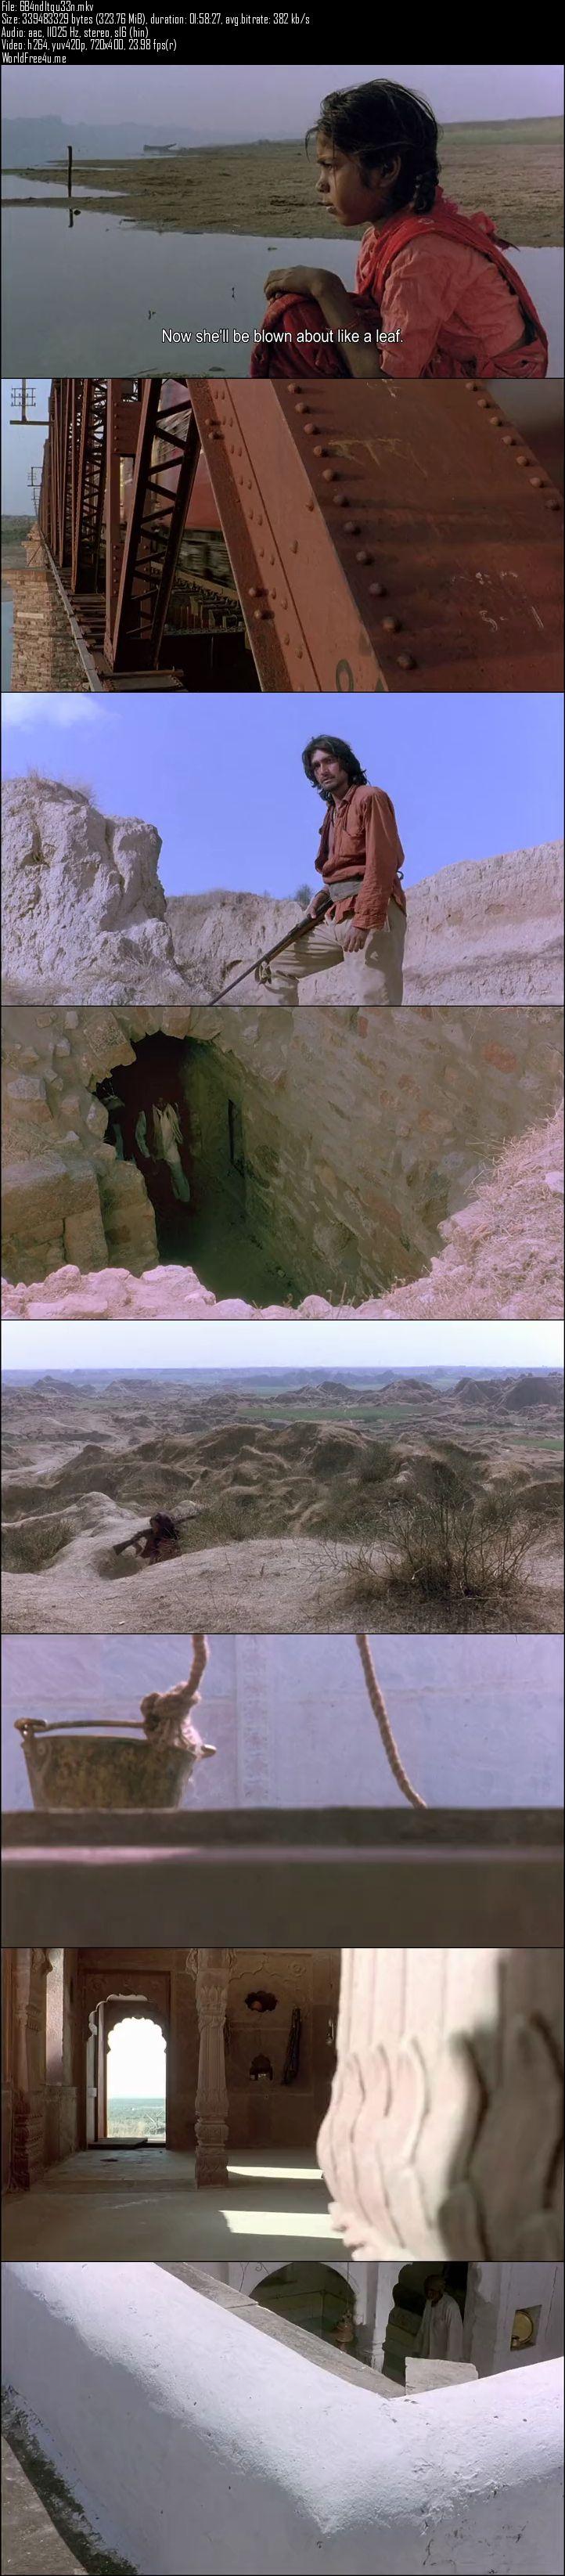 Screen Shot Of Bandit Queen 1994 Full Movie Free Download 300MB BRRip 480P ESubs Watch Online